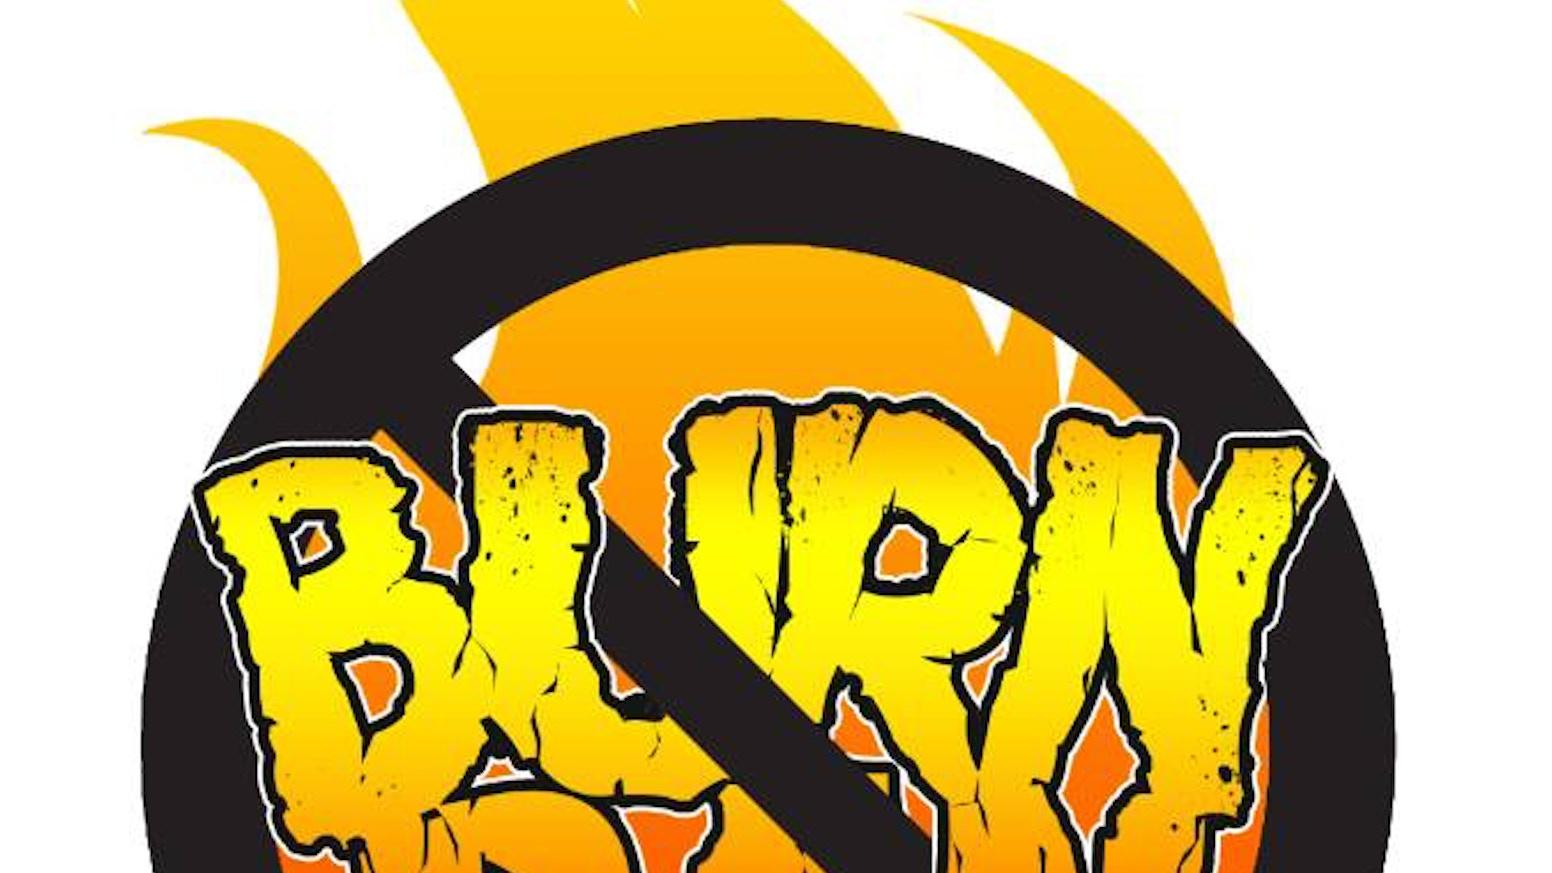 burn ban needs cardboard cutouts of famous people by burn ban